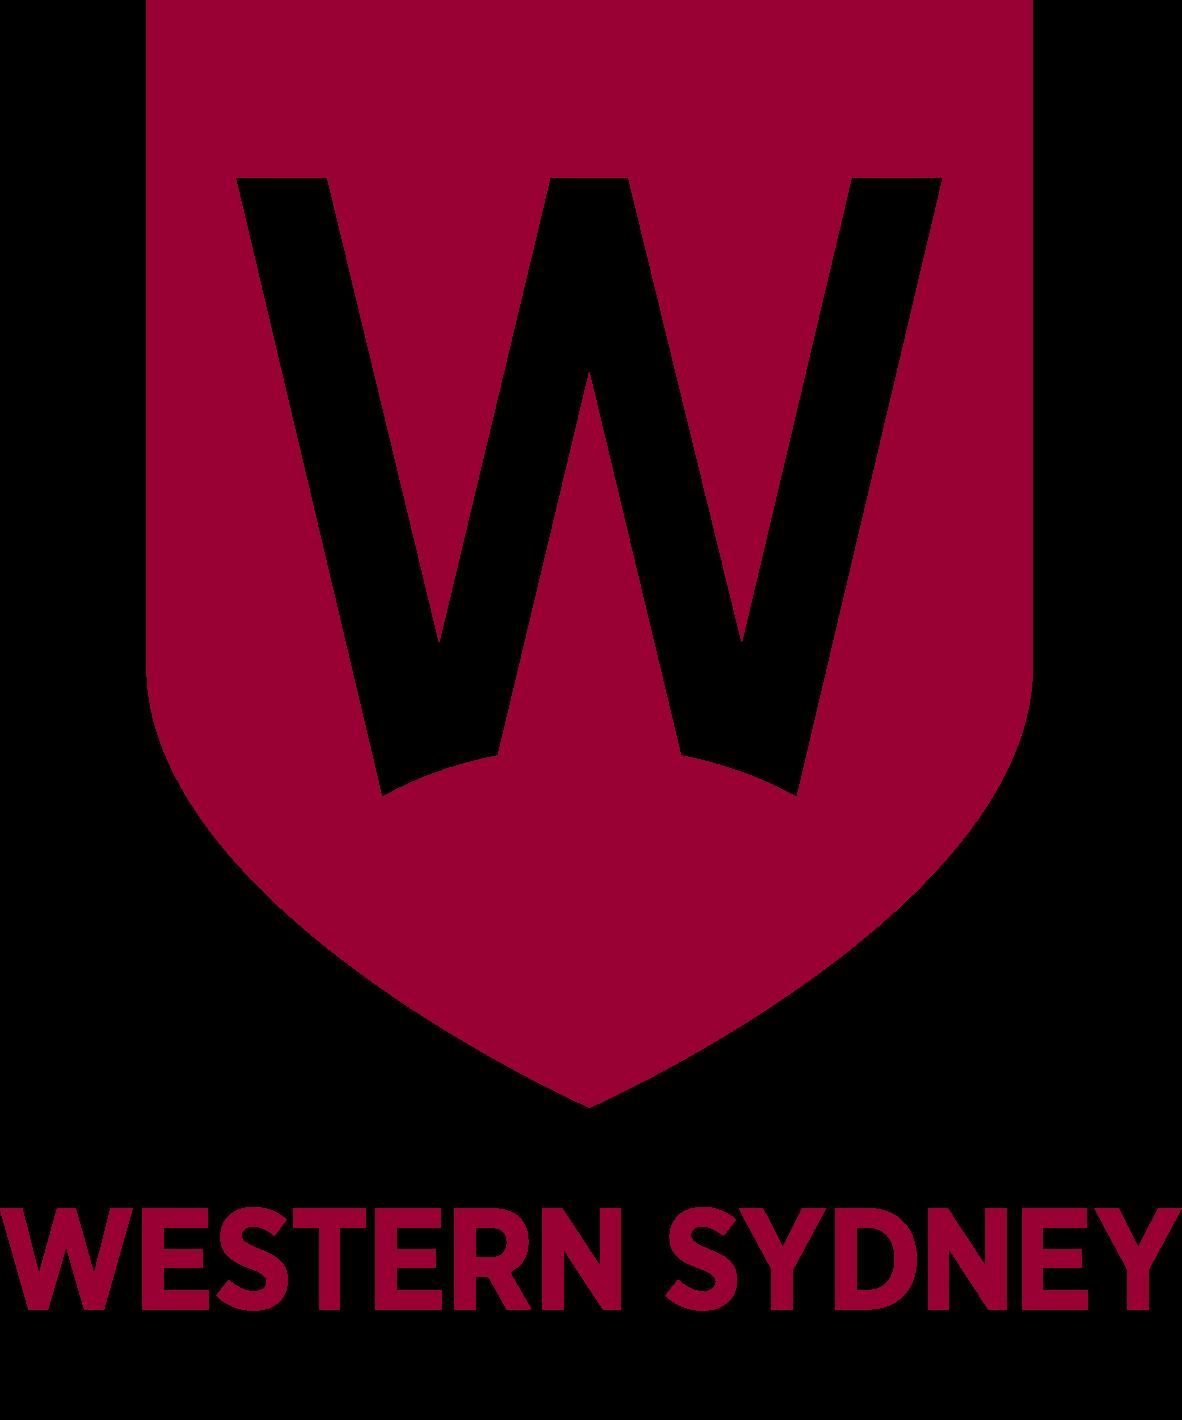 Western Sydney University (WSU), Australia